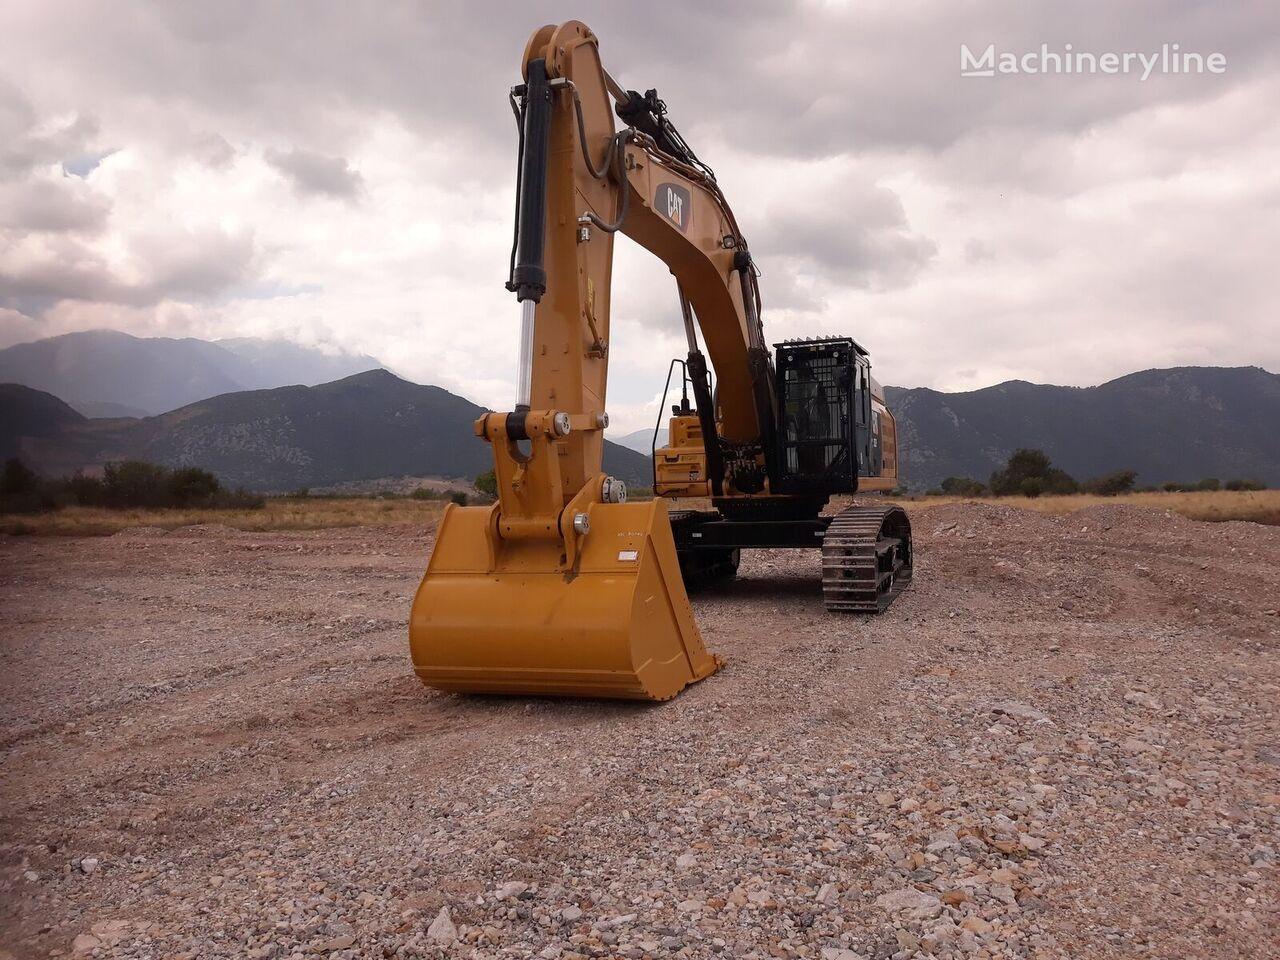 new CATERPILLAR 352F tracked excavator